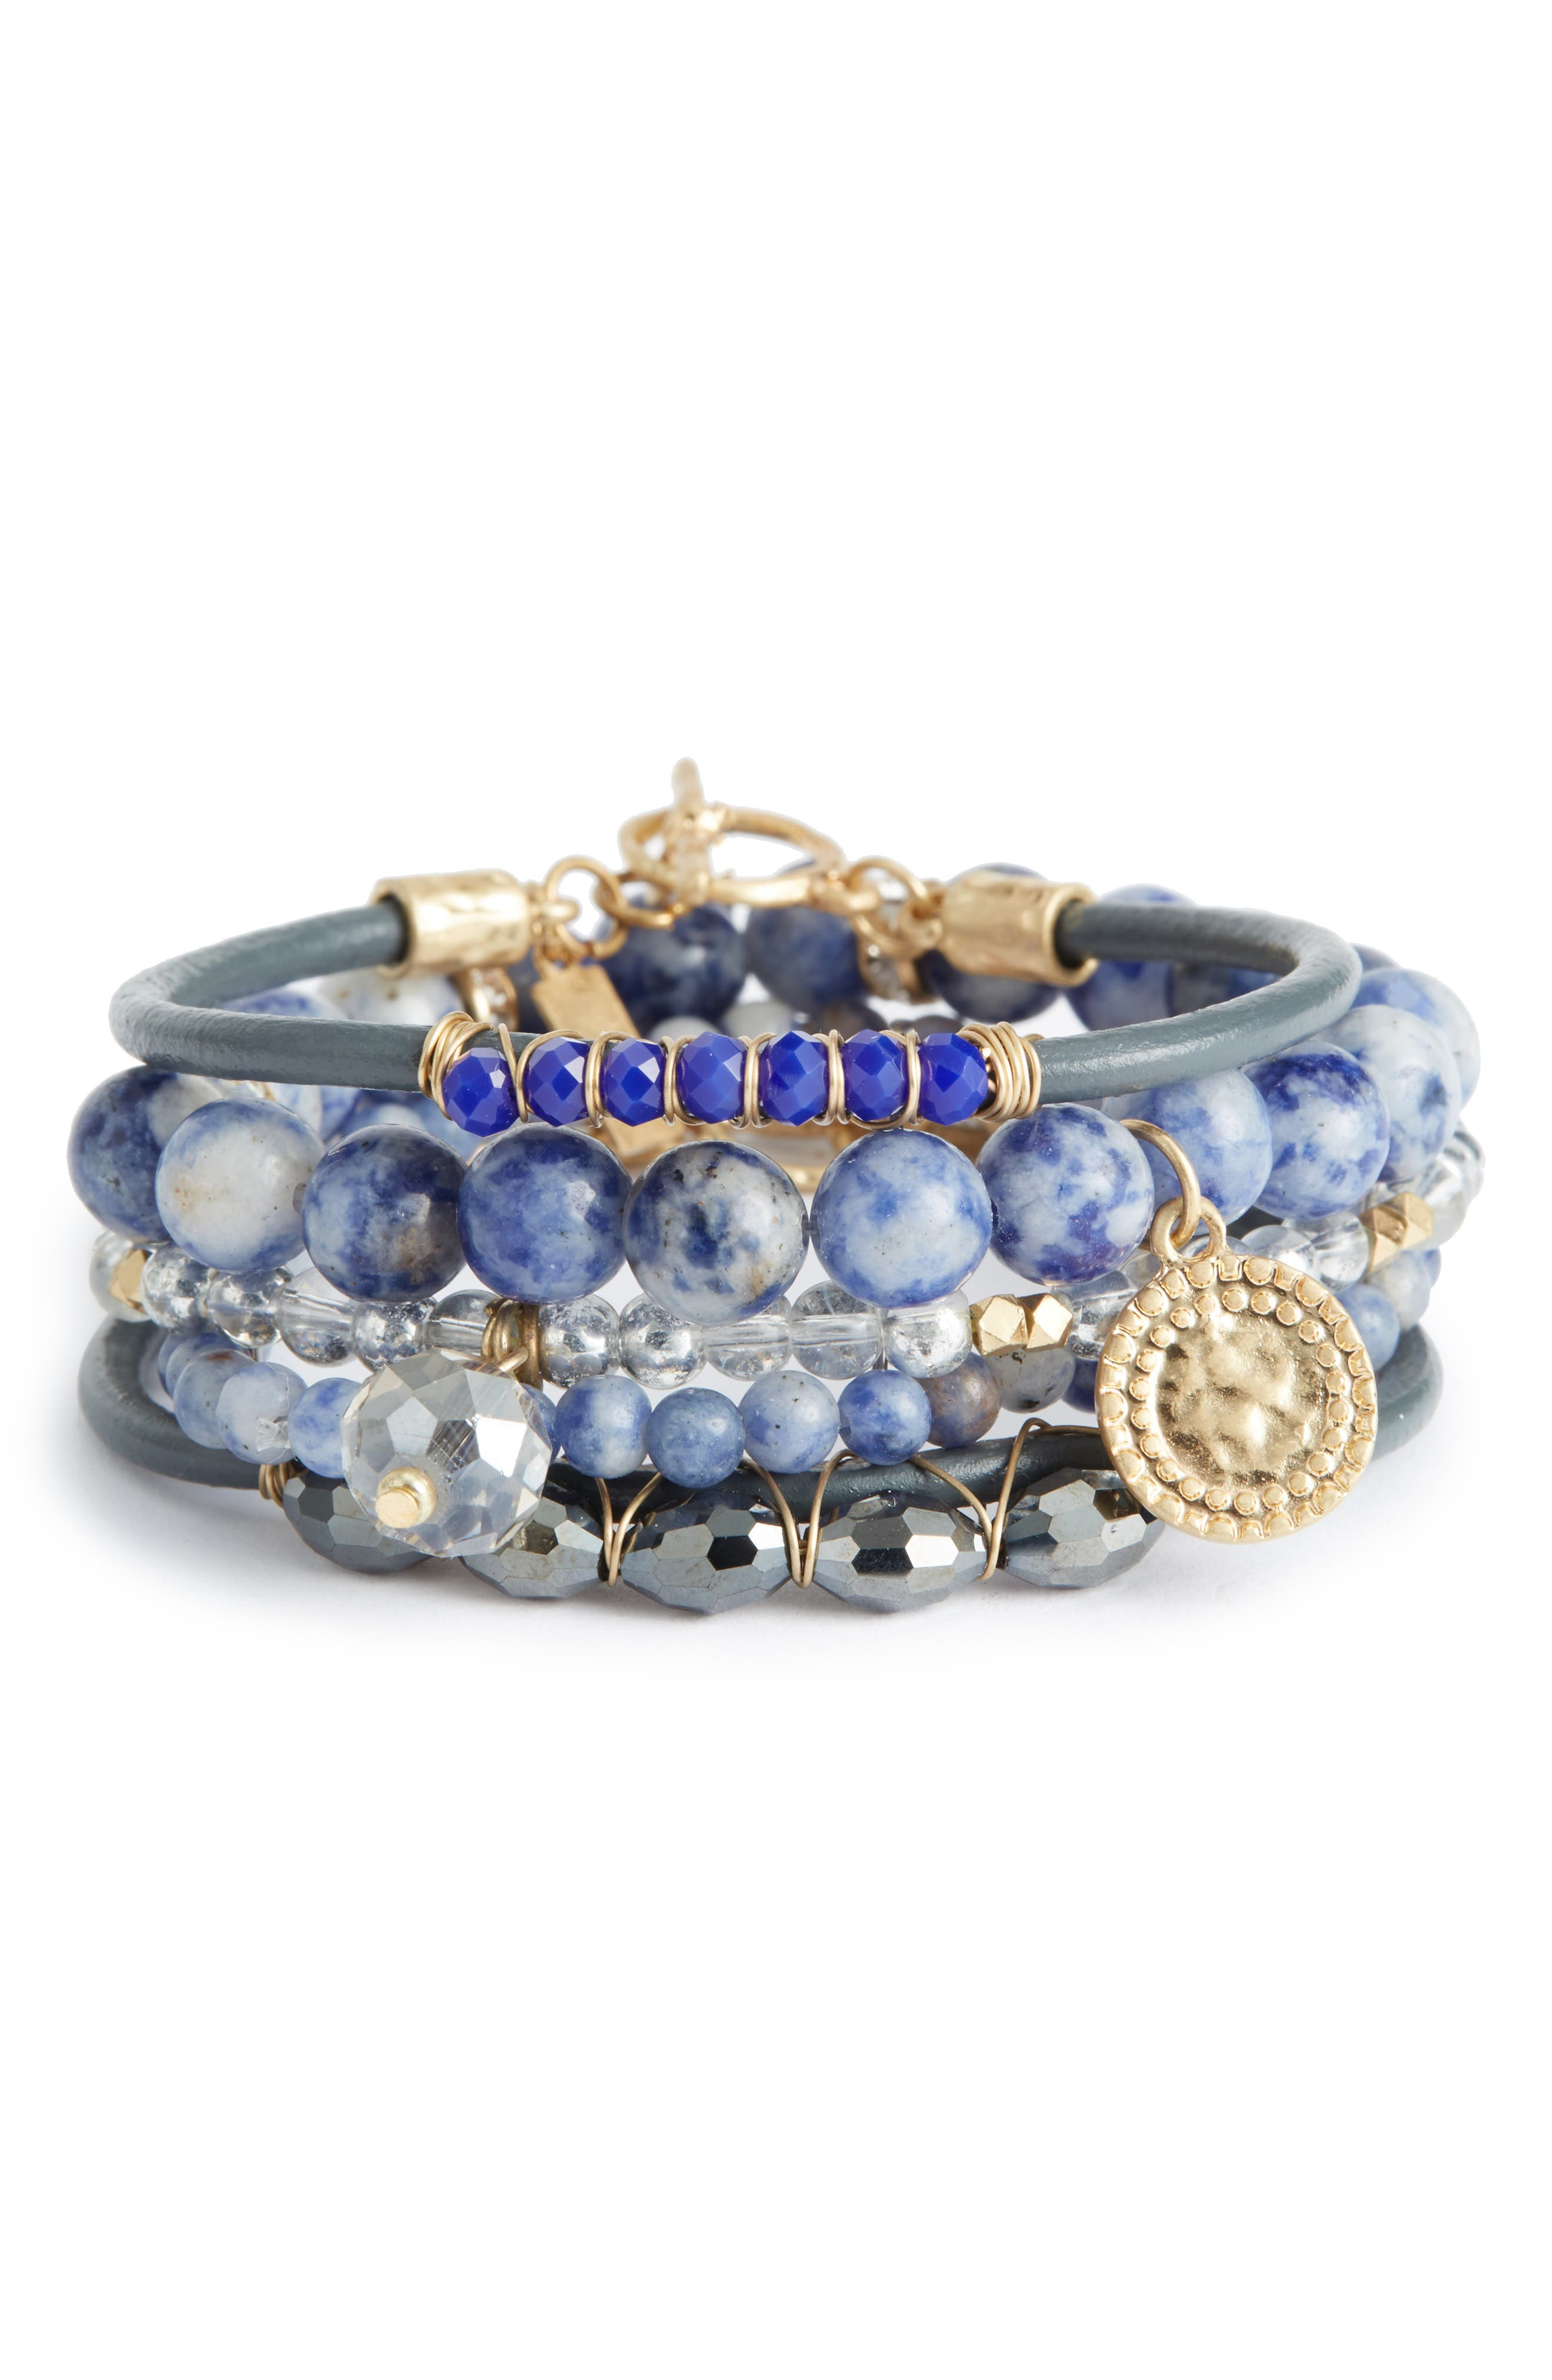 5-Piece Semiprecious Stone Stacking Bracelet,                             Main thumbnail 1, color,                             TEAL